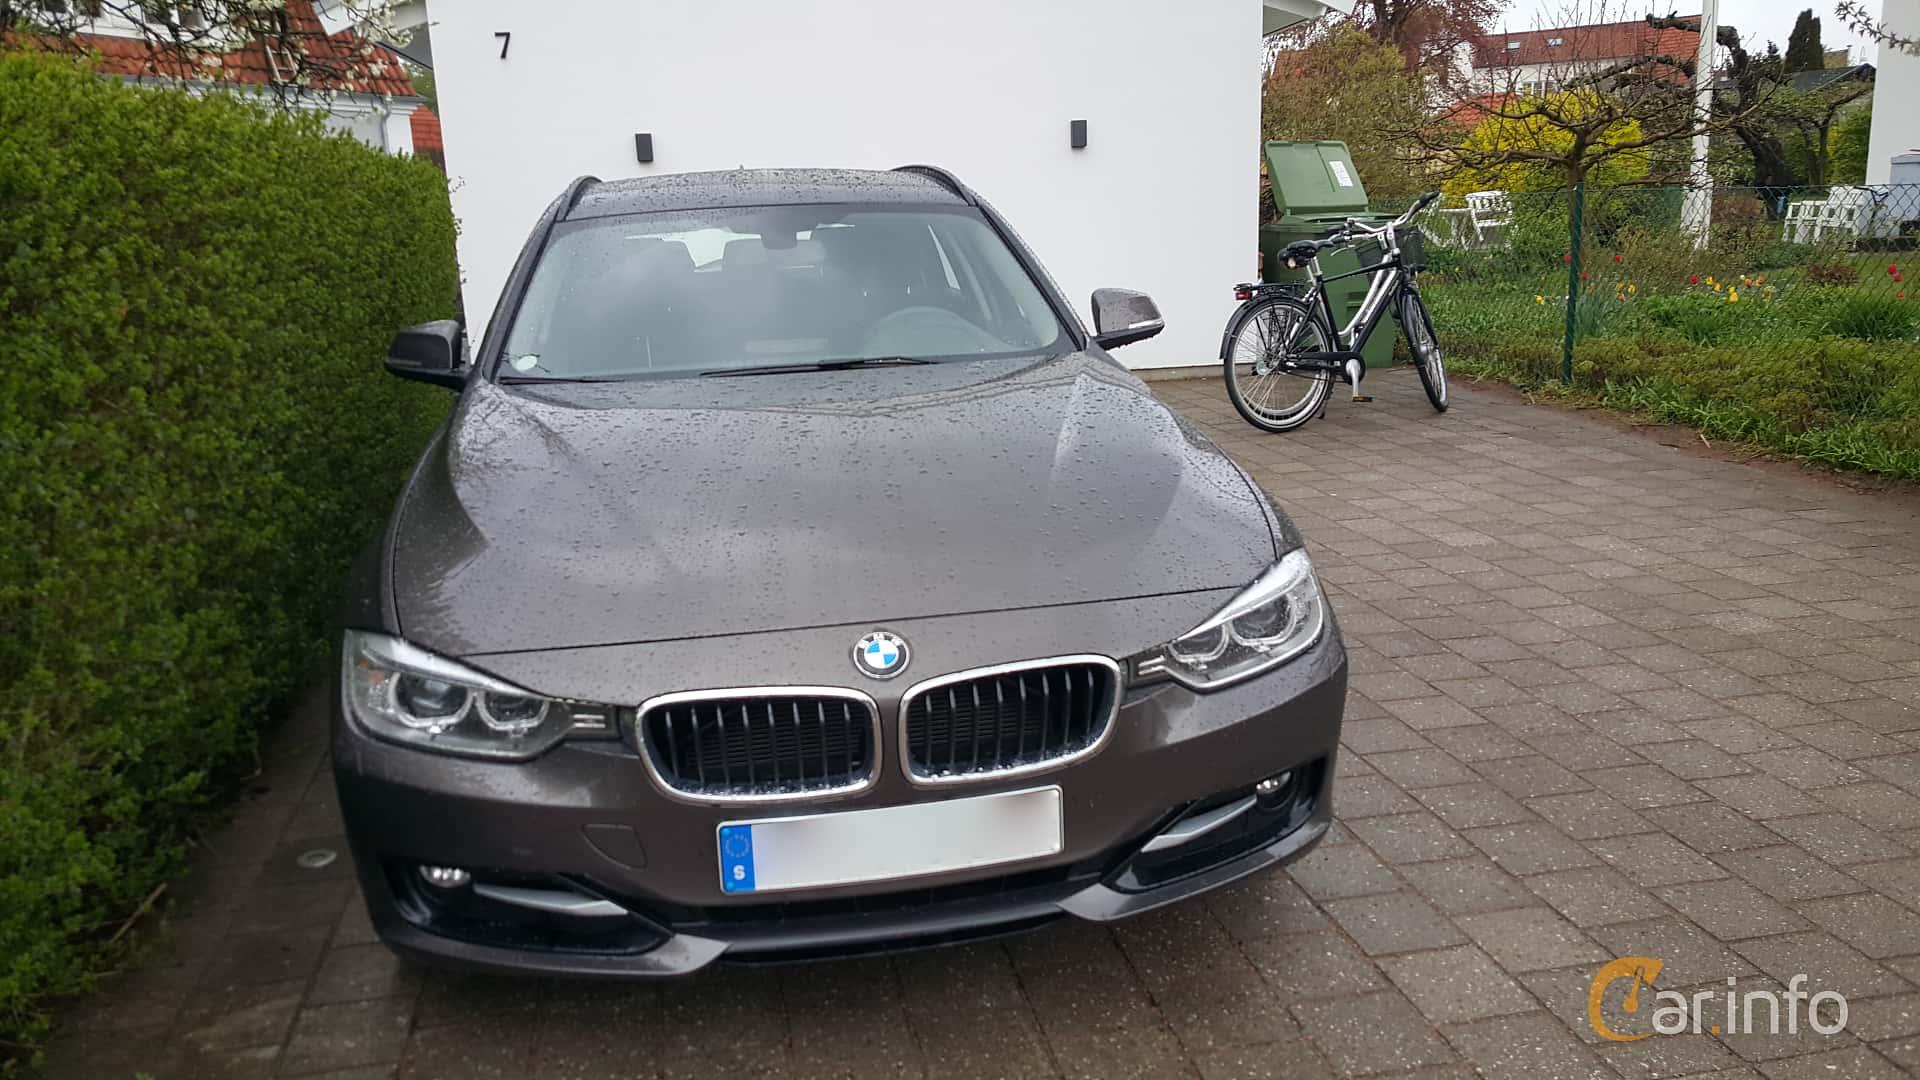 BMW 318d xDrive Touring Manual, 143hp, 2015